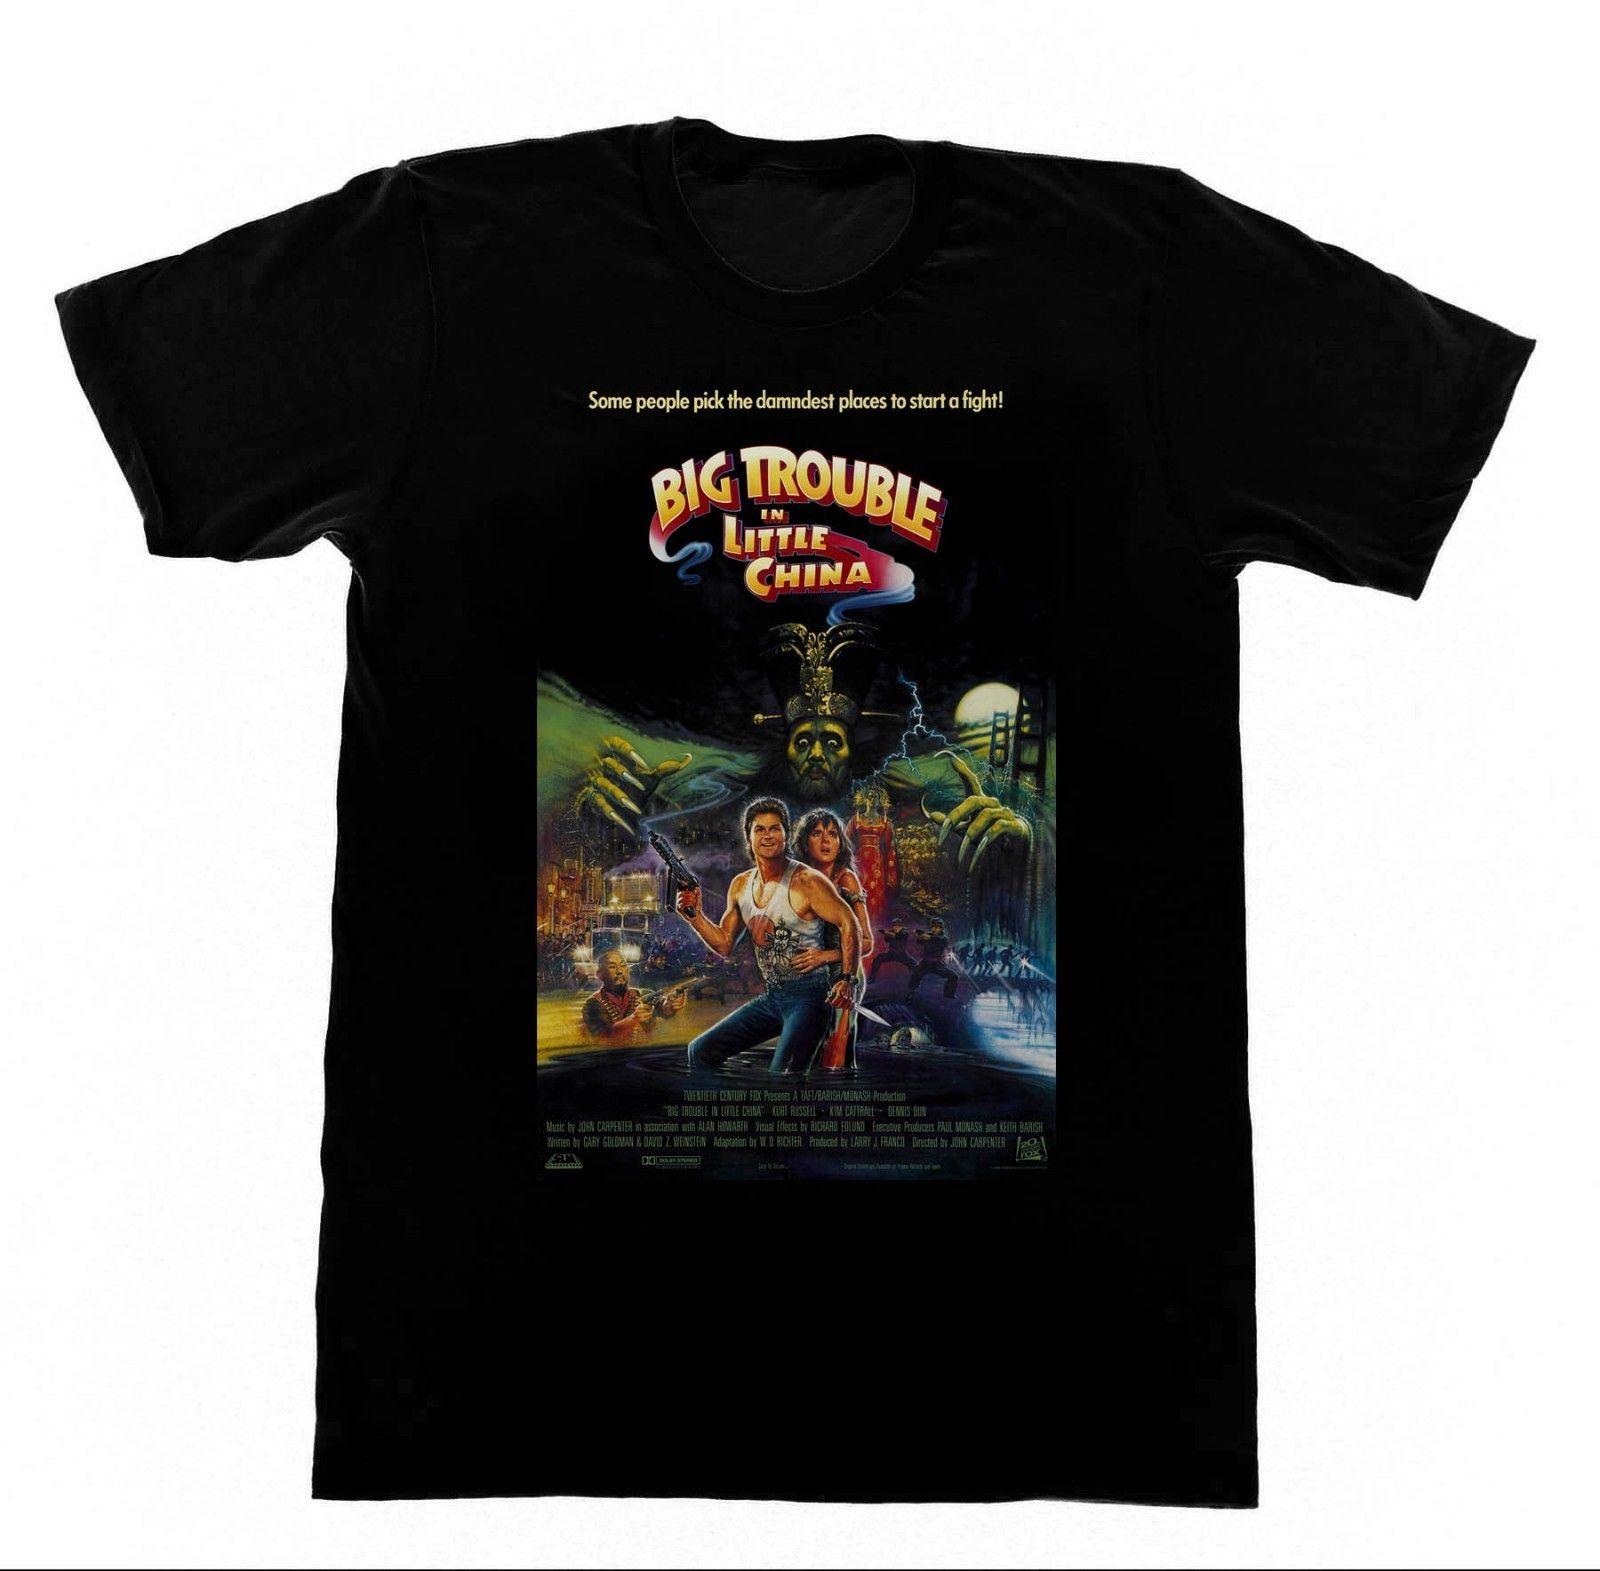 Grandes problemas Inittle China camisa T camisa 83 camisa Kurt Russel-John Carpenter estilo Popular hombre Camiseta Tee Top